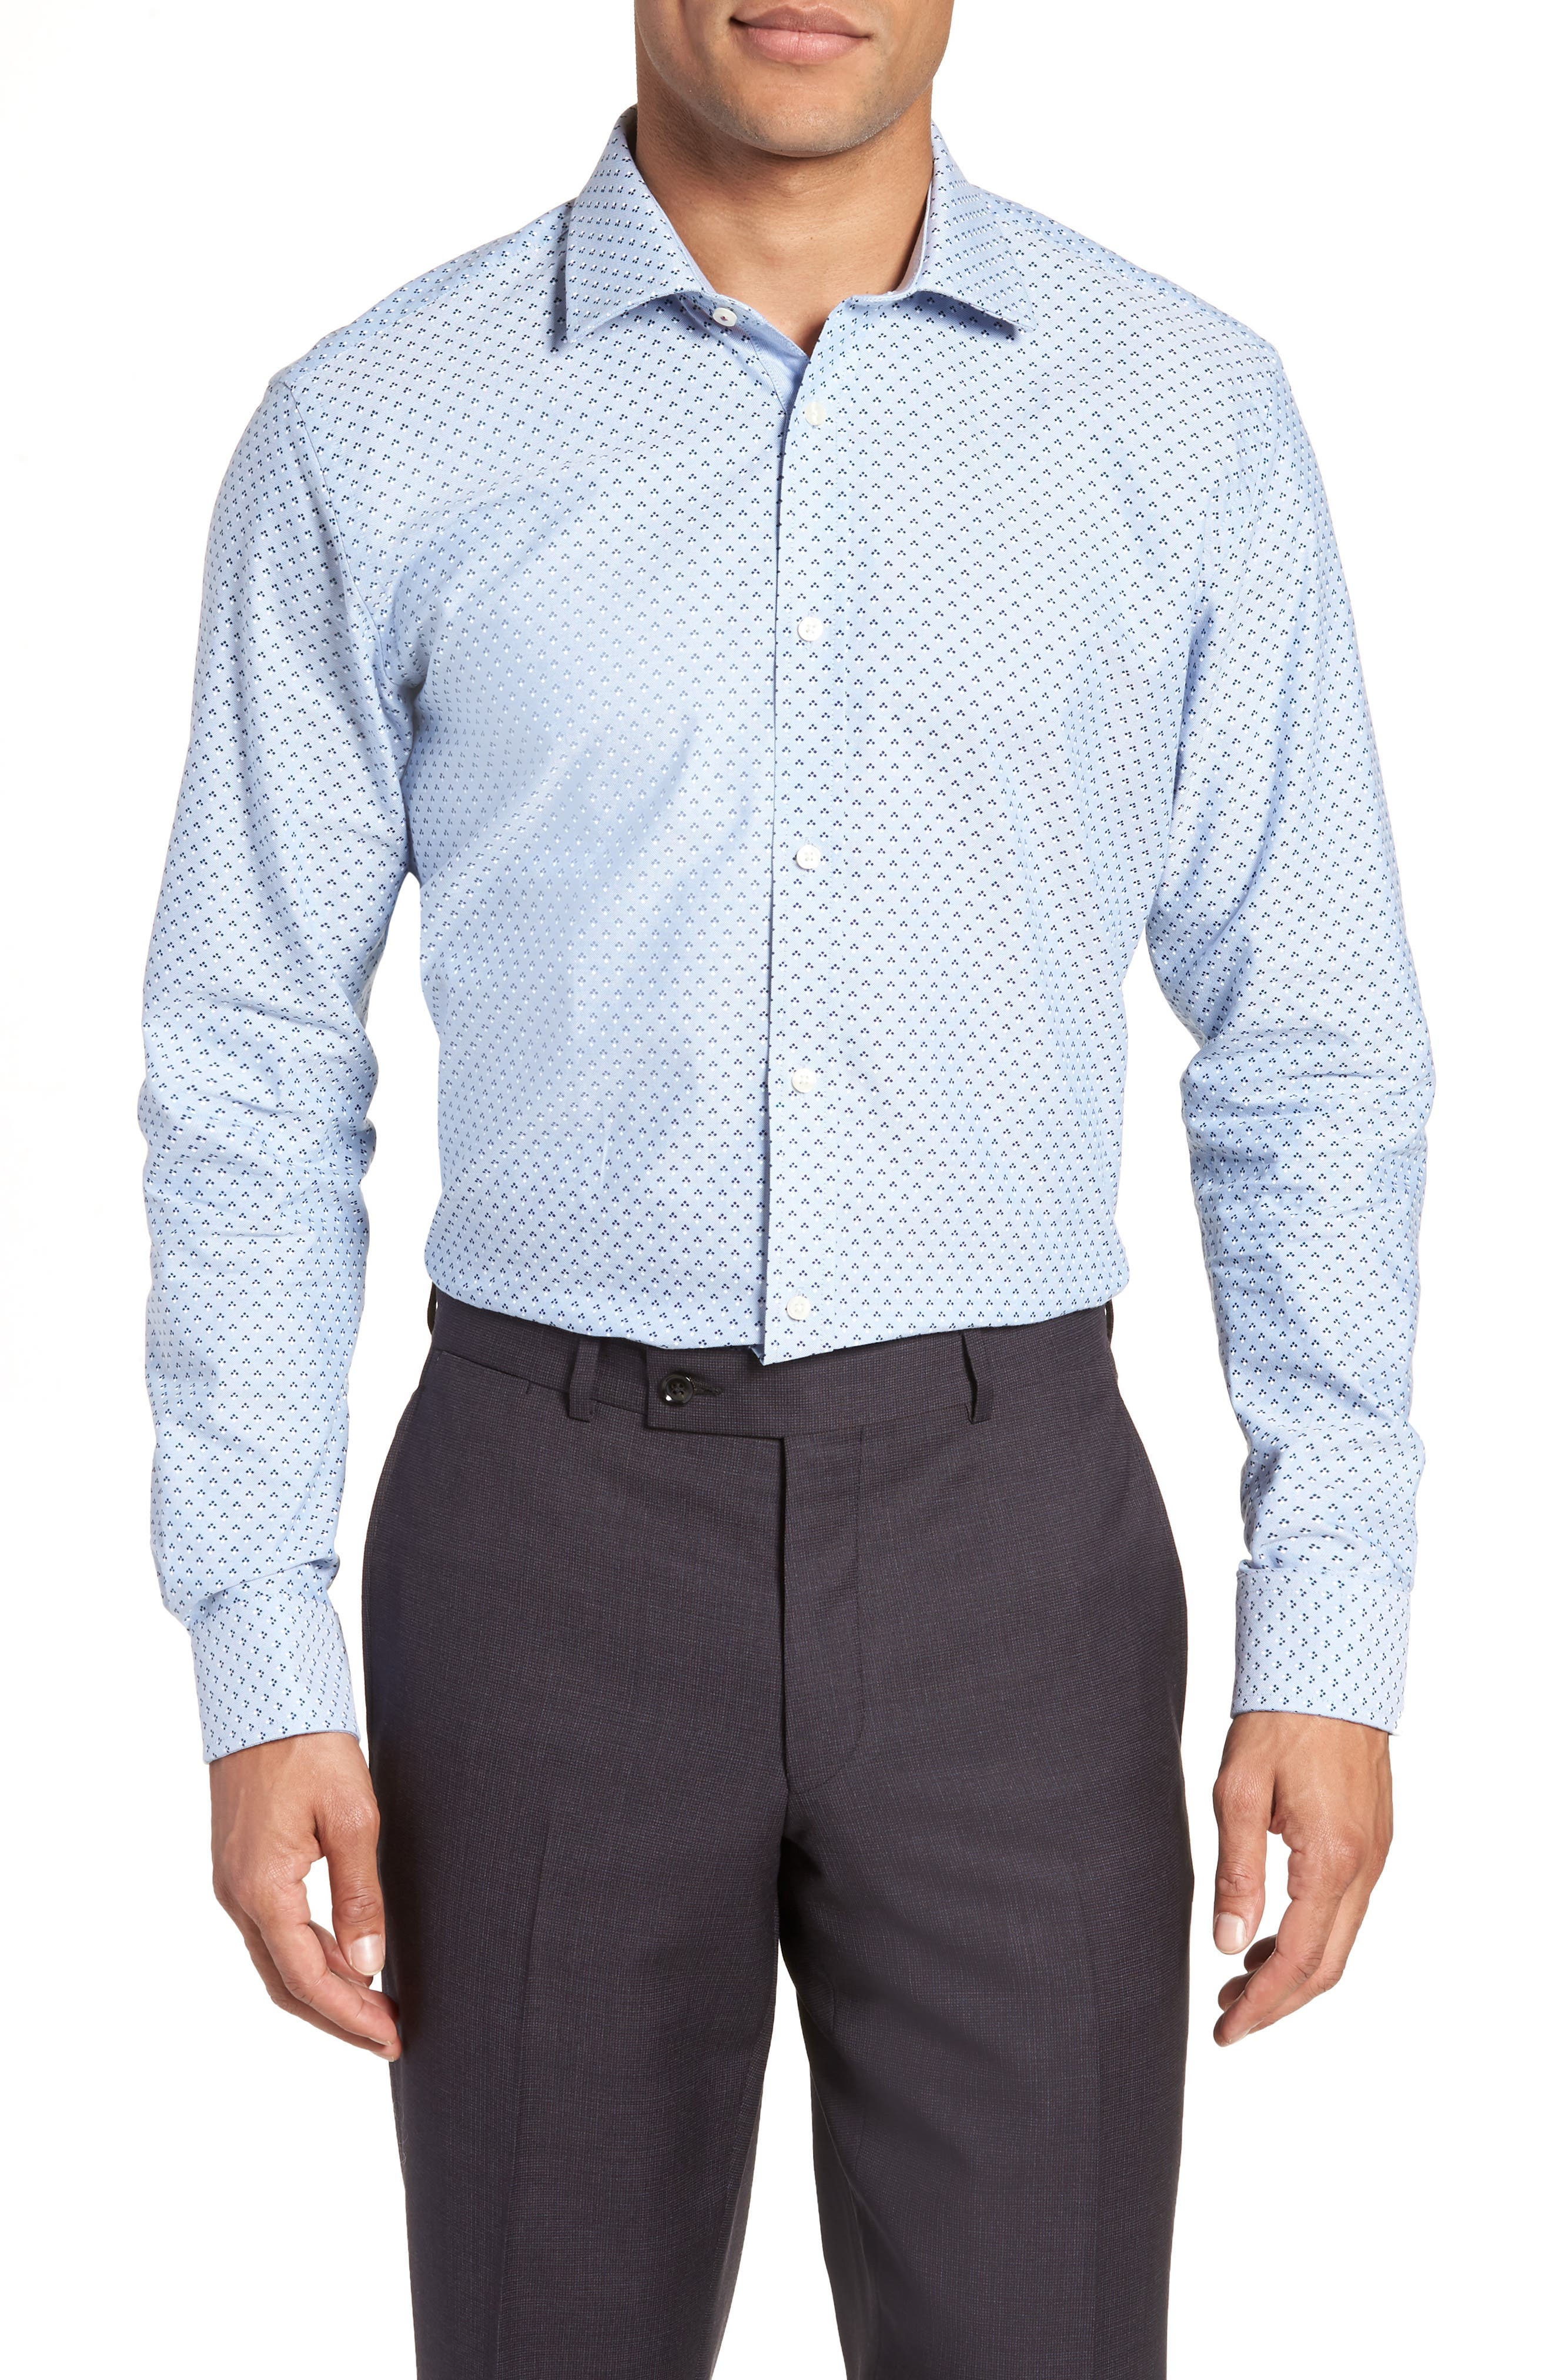 Forestr Trim Fit Geometric Dress Shirt,                             Main thumbnail 1, color,                             421